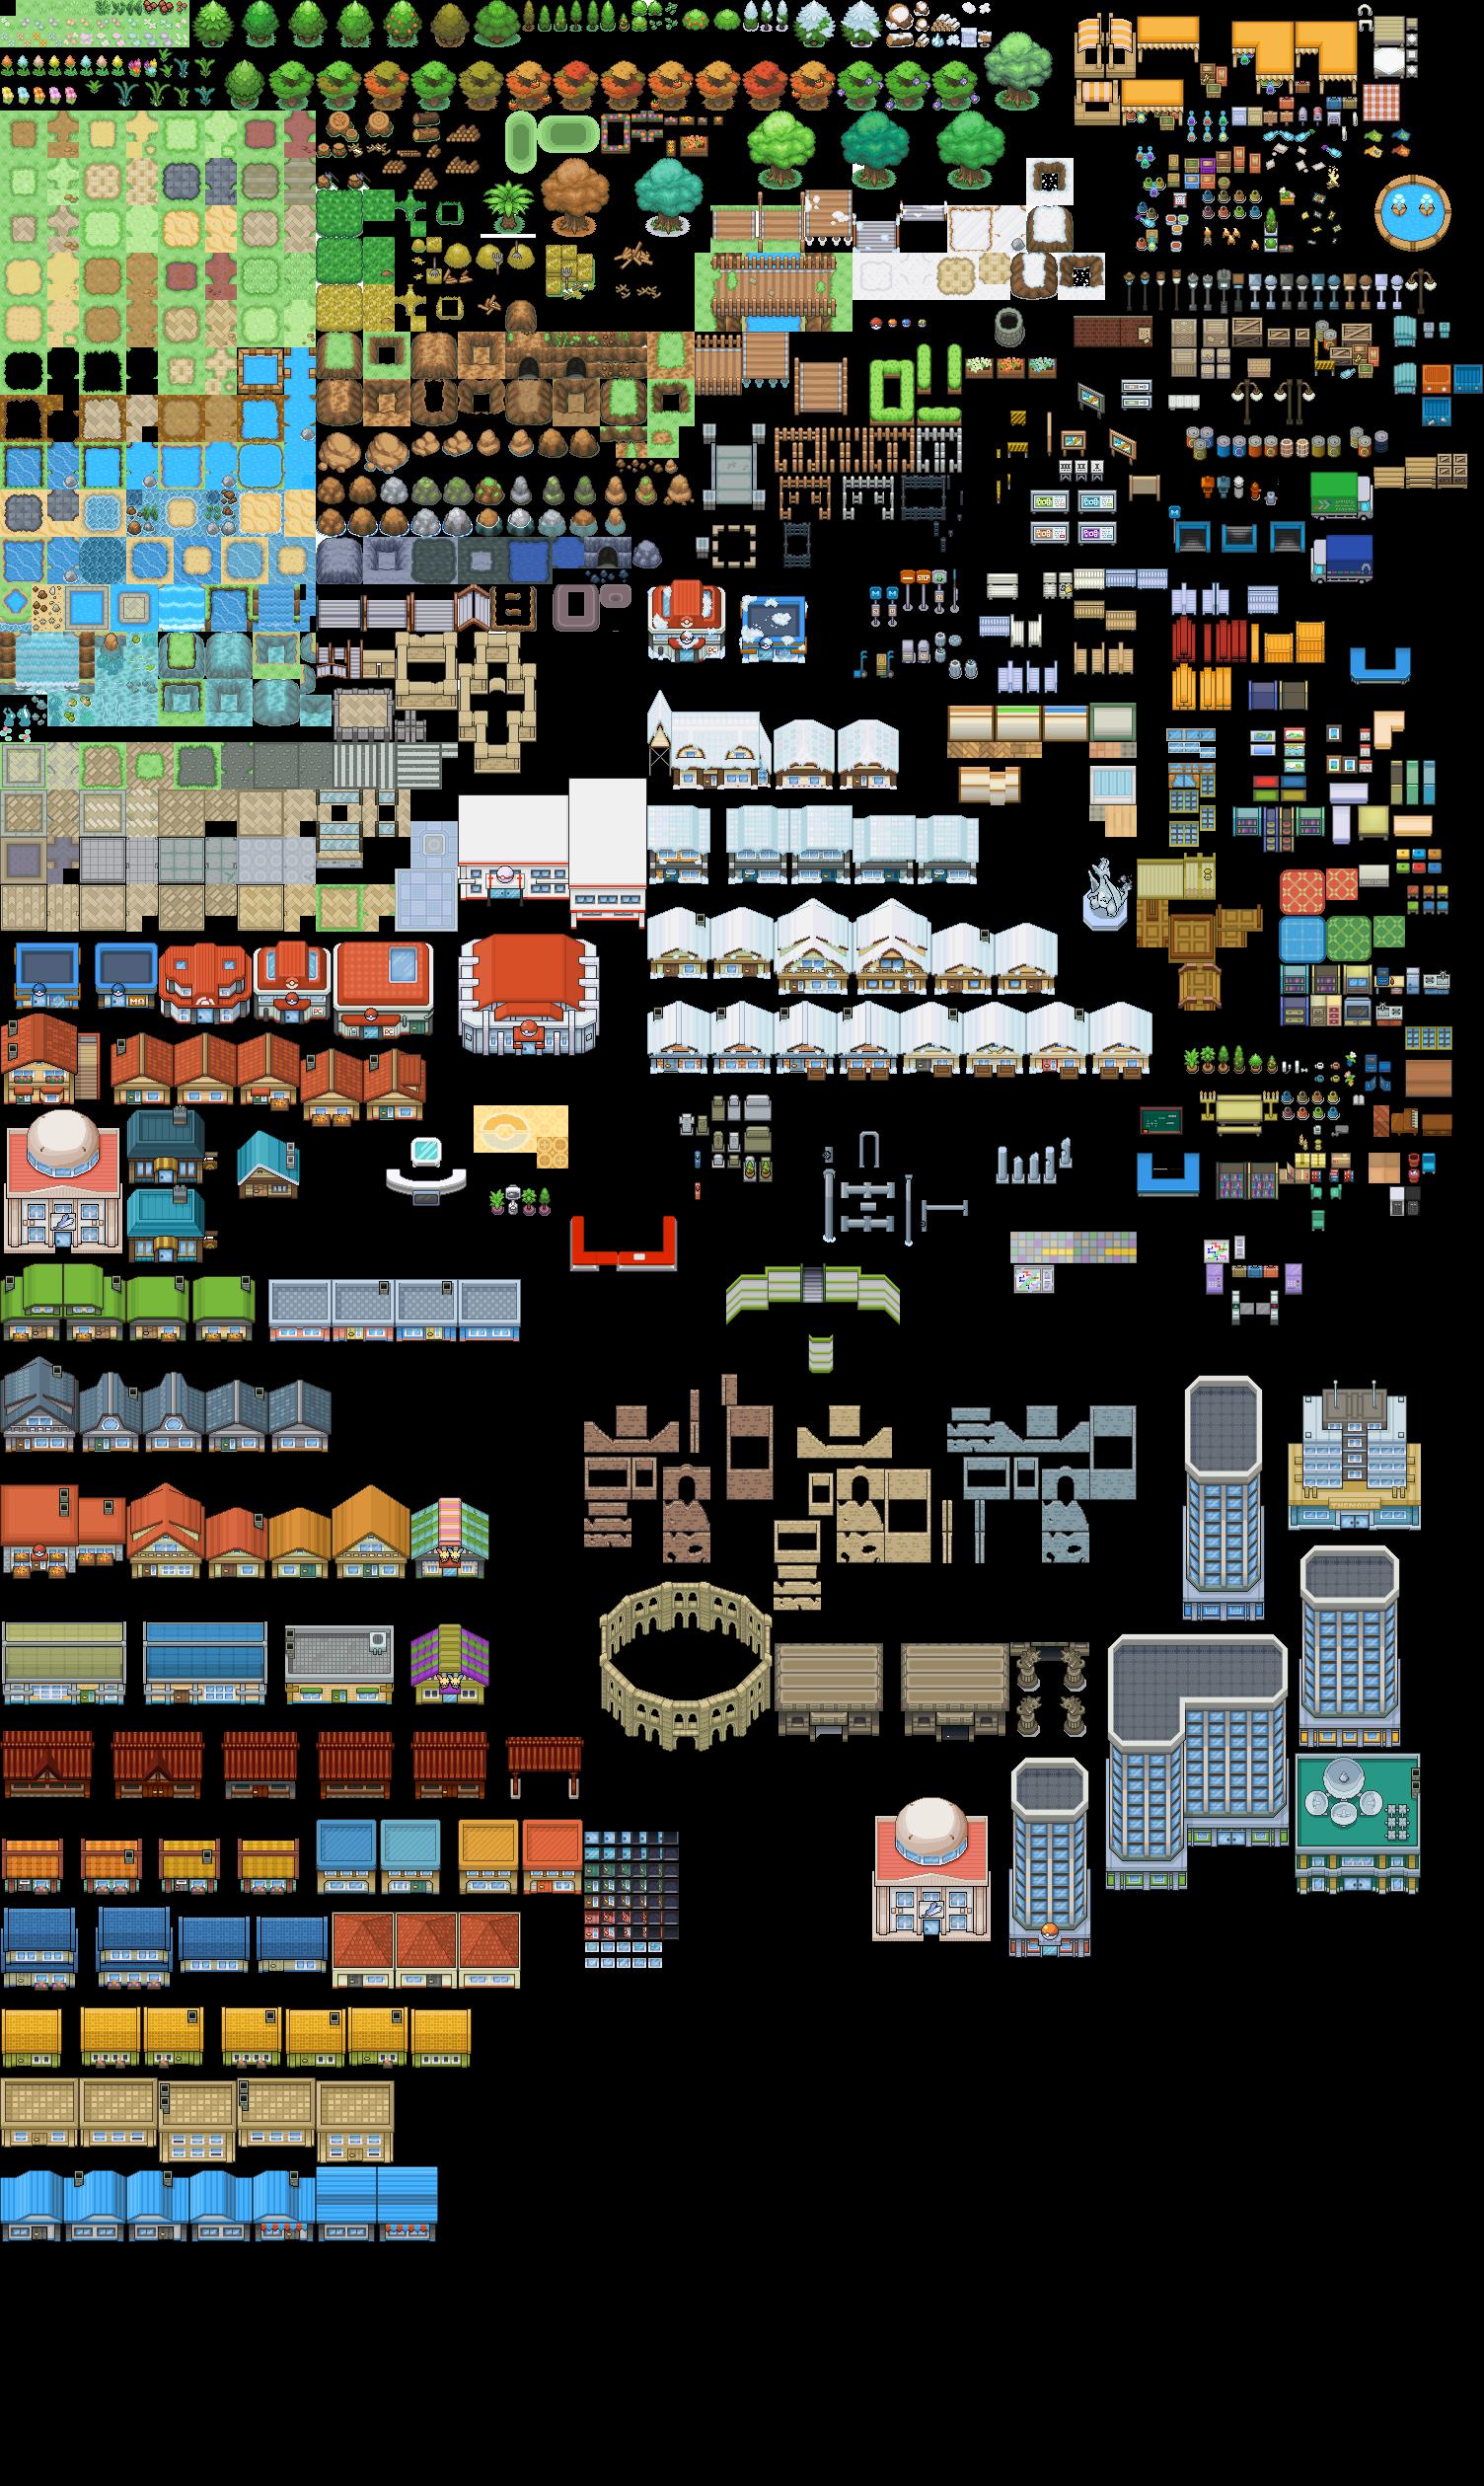 Pokemon Tileset From Public Tiles WIP by ChaoticCherryCakeviantart on deviantART Pixel Art Collection Pinterest